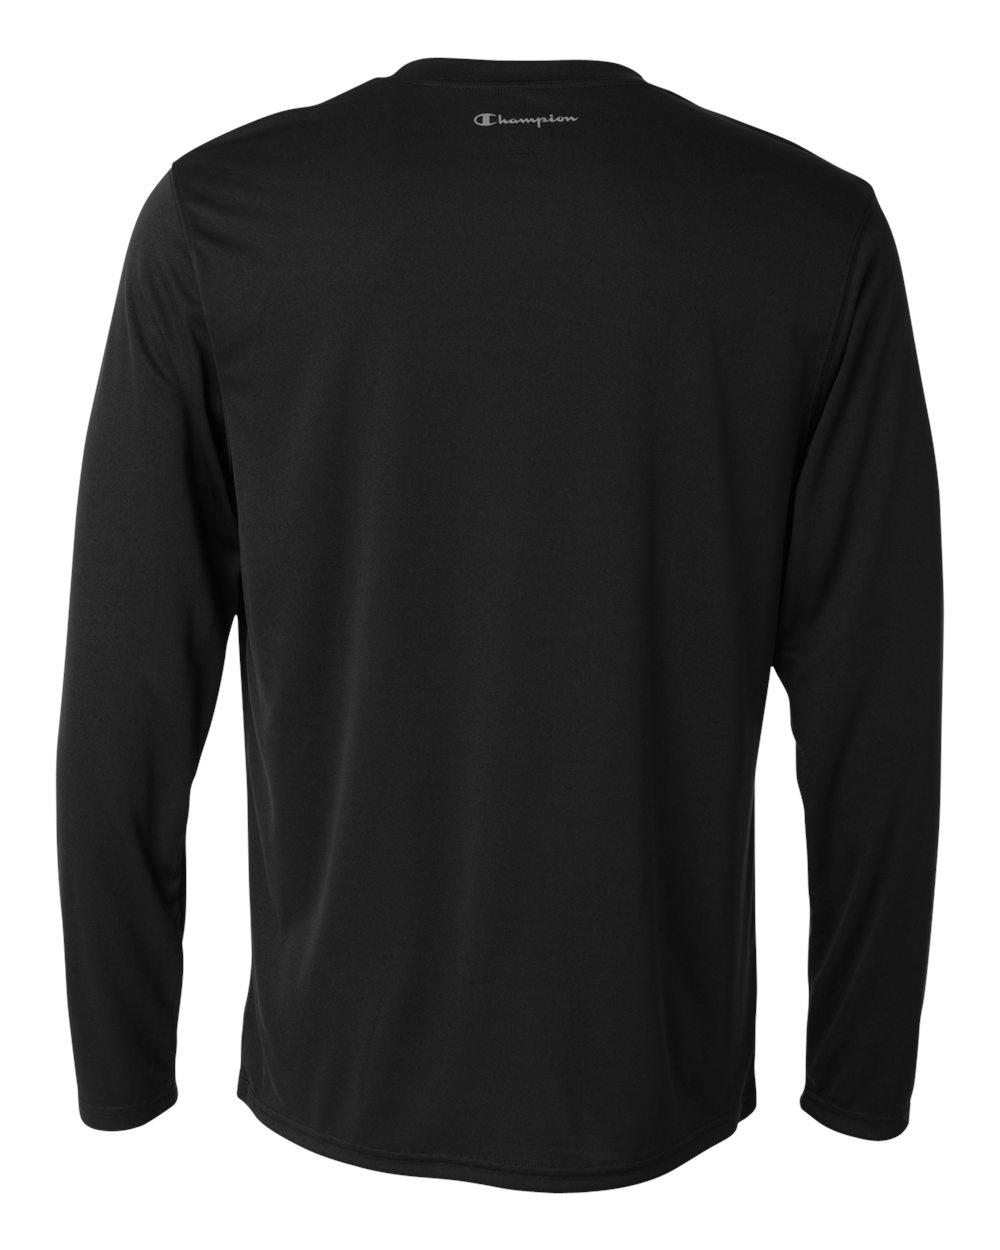 Champion-Men-039-s-Double-Dry-4-1-oz-Long-Sleeve-Interlock-T-Shirt-CW26-XS-3XL thumbnail 5